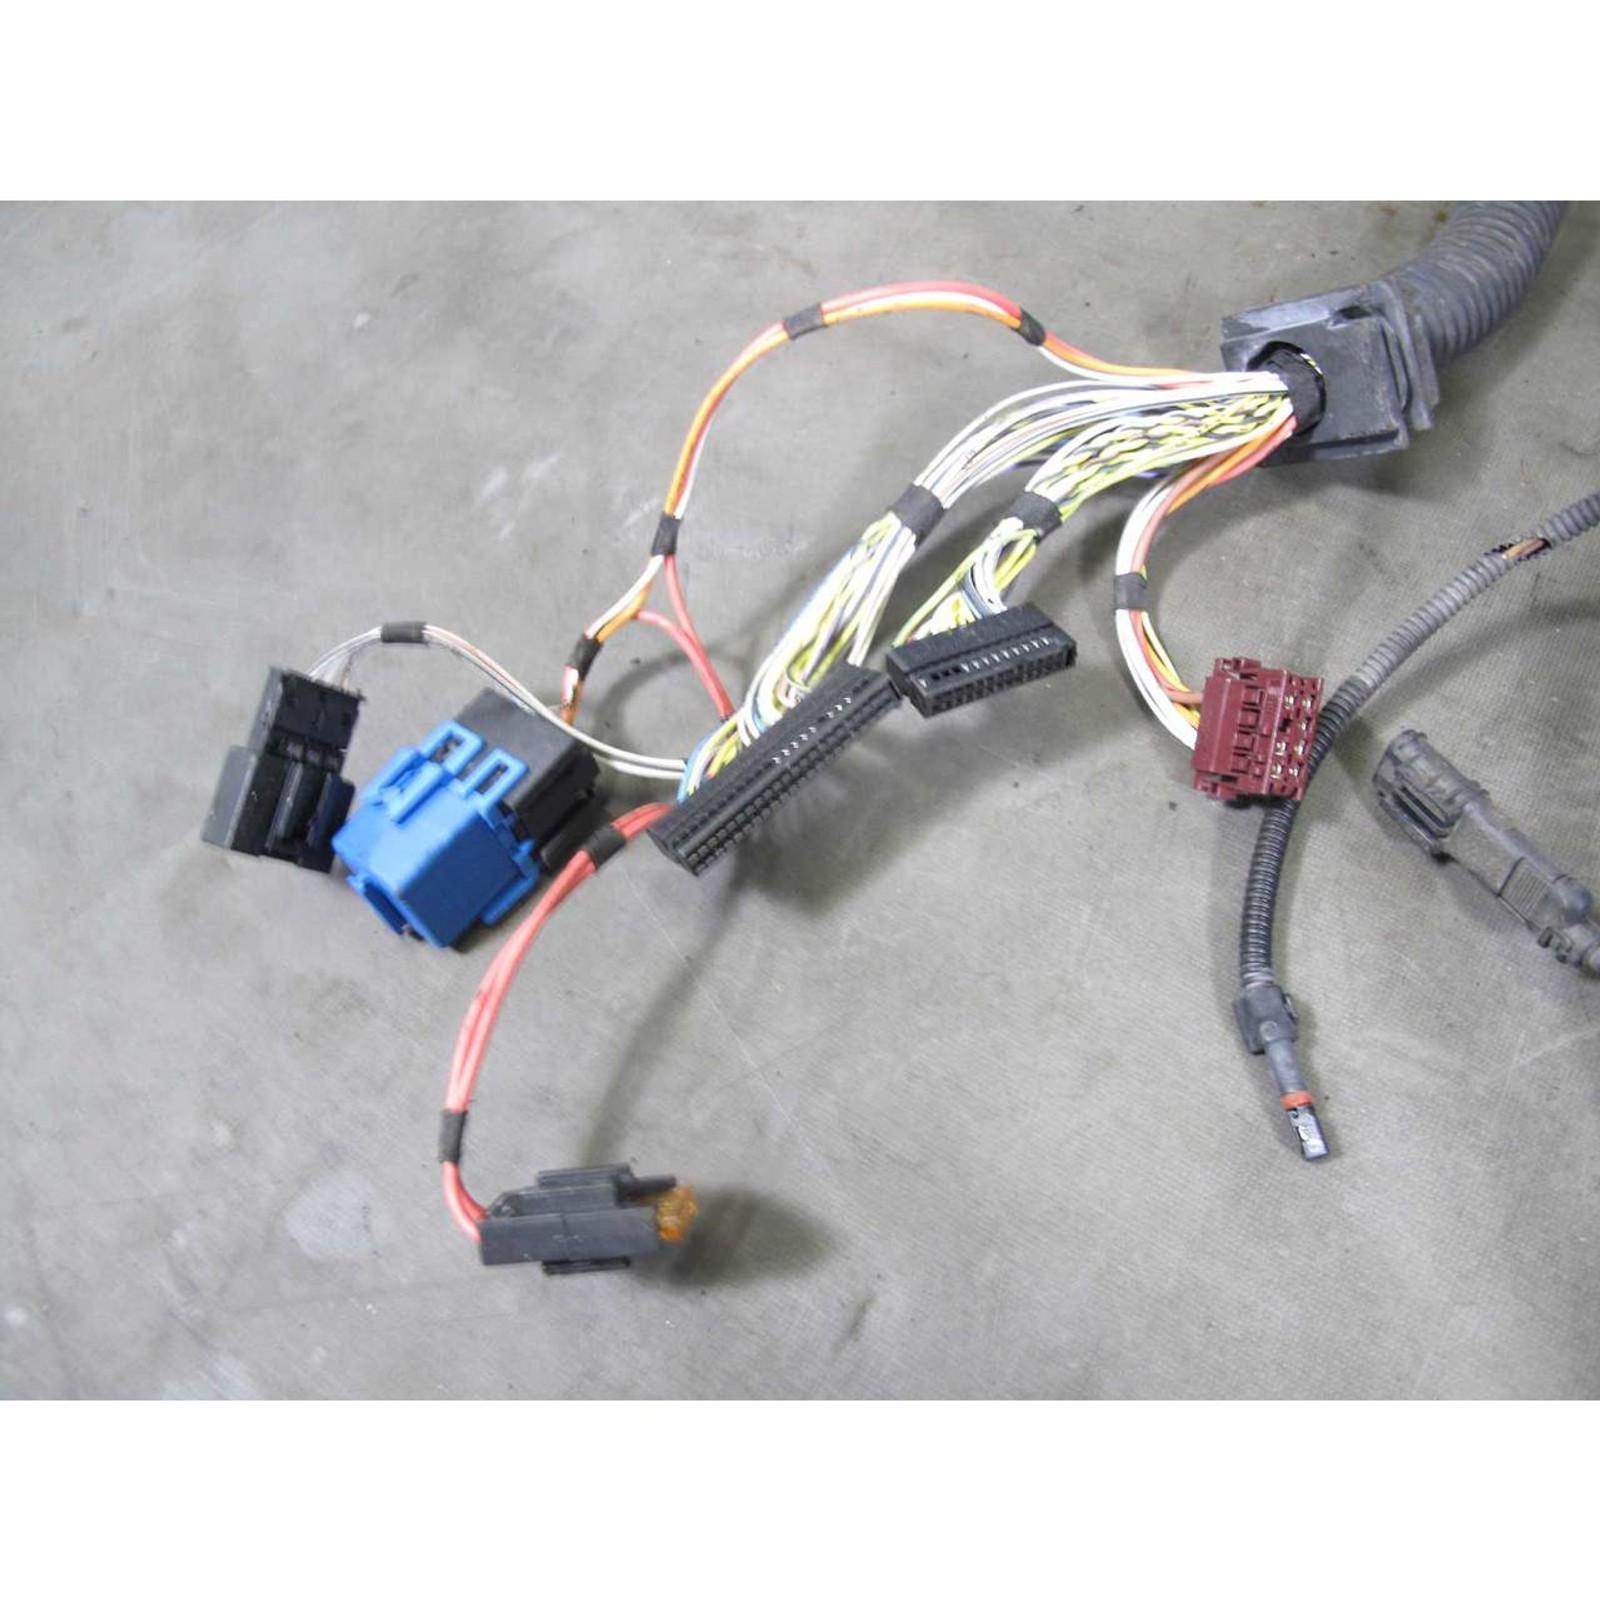 Bmw E90 Headlight Wiring Harness. . Wiring Diagram Harness Bmw Diagram Wiring E Headlight on